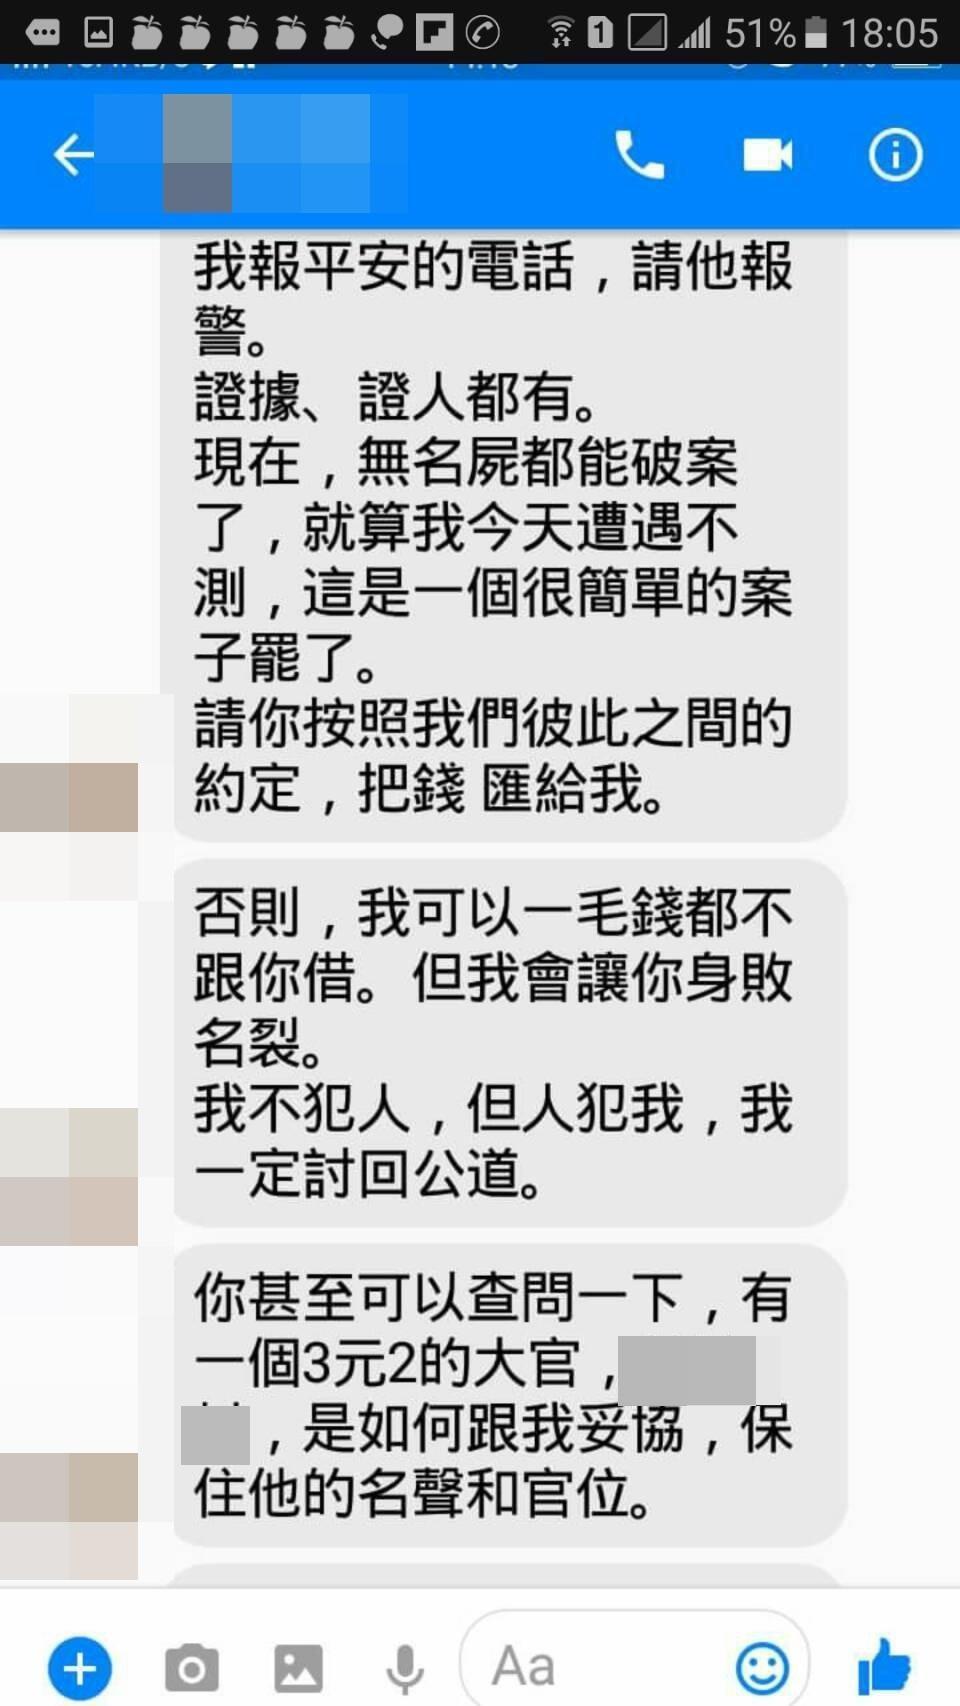 H女耍無賴就是不還錢,甚至要小陳去打聽該名台南刑大大隊長為了名聲跟官位,最後也跟她妥協。(翻攝畫面)